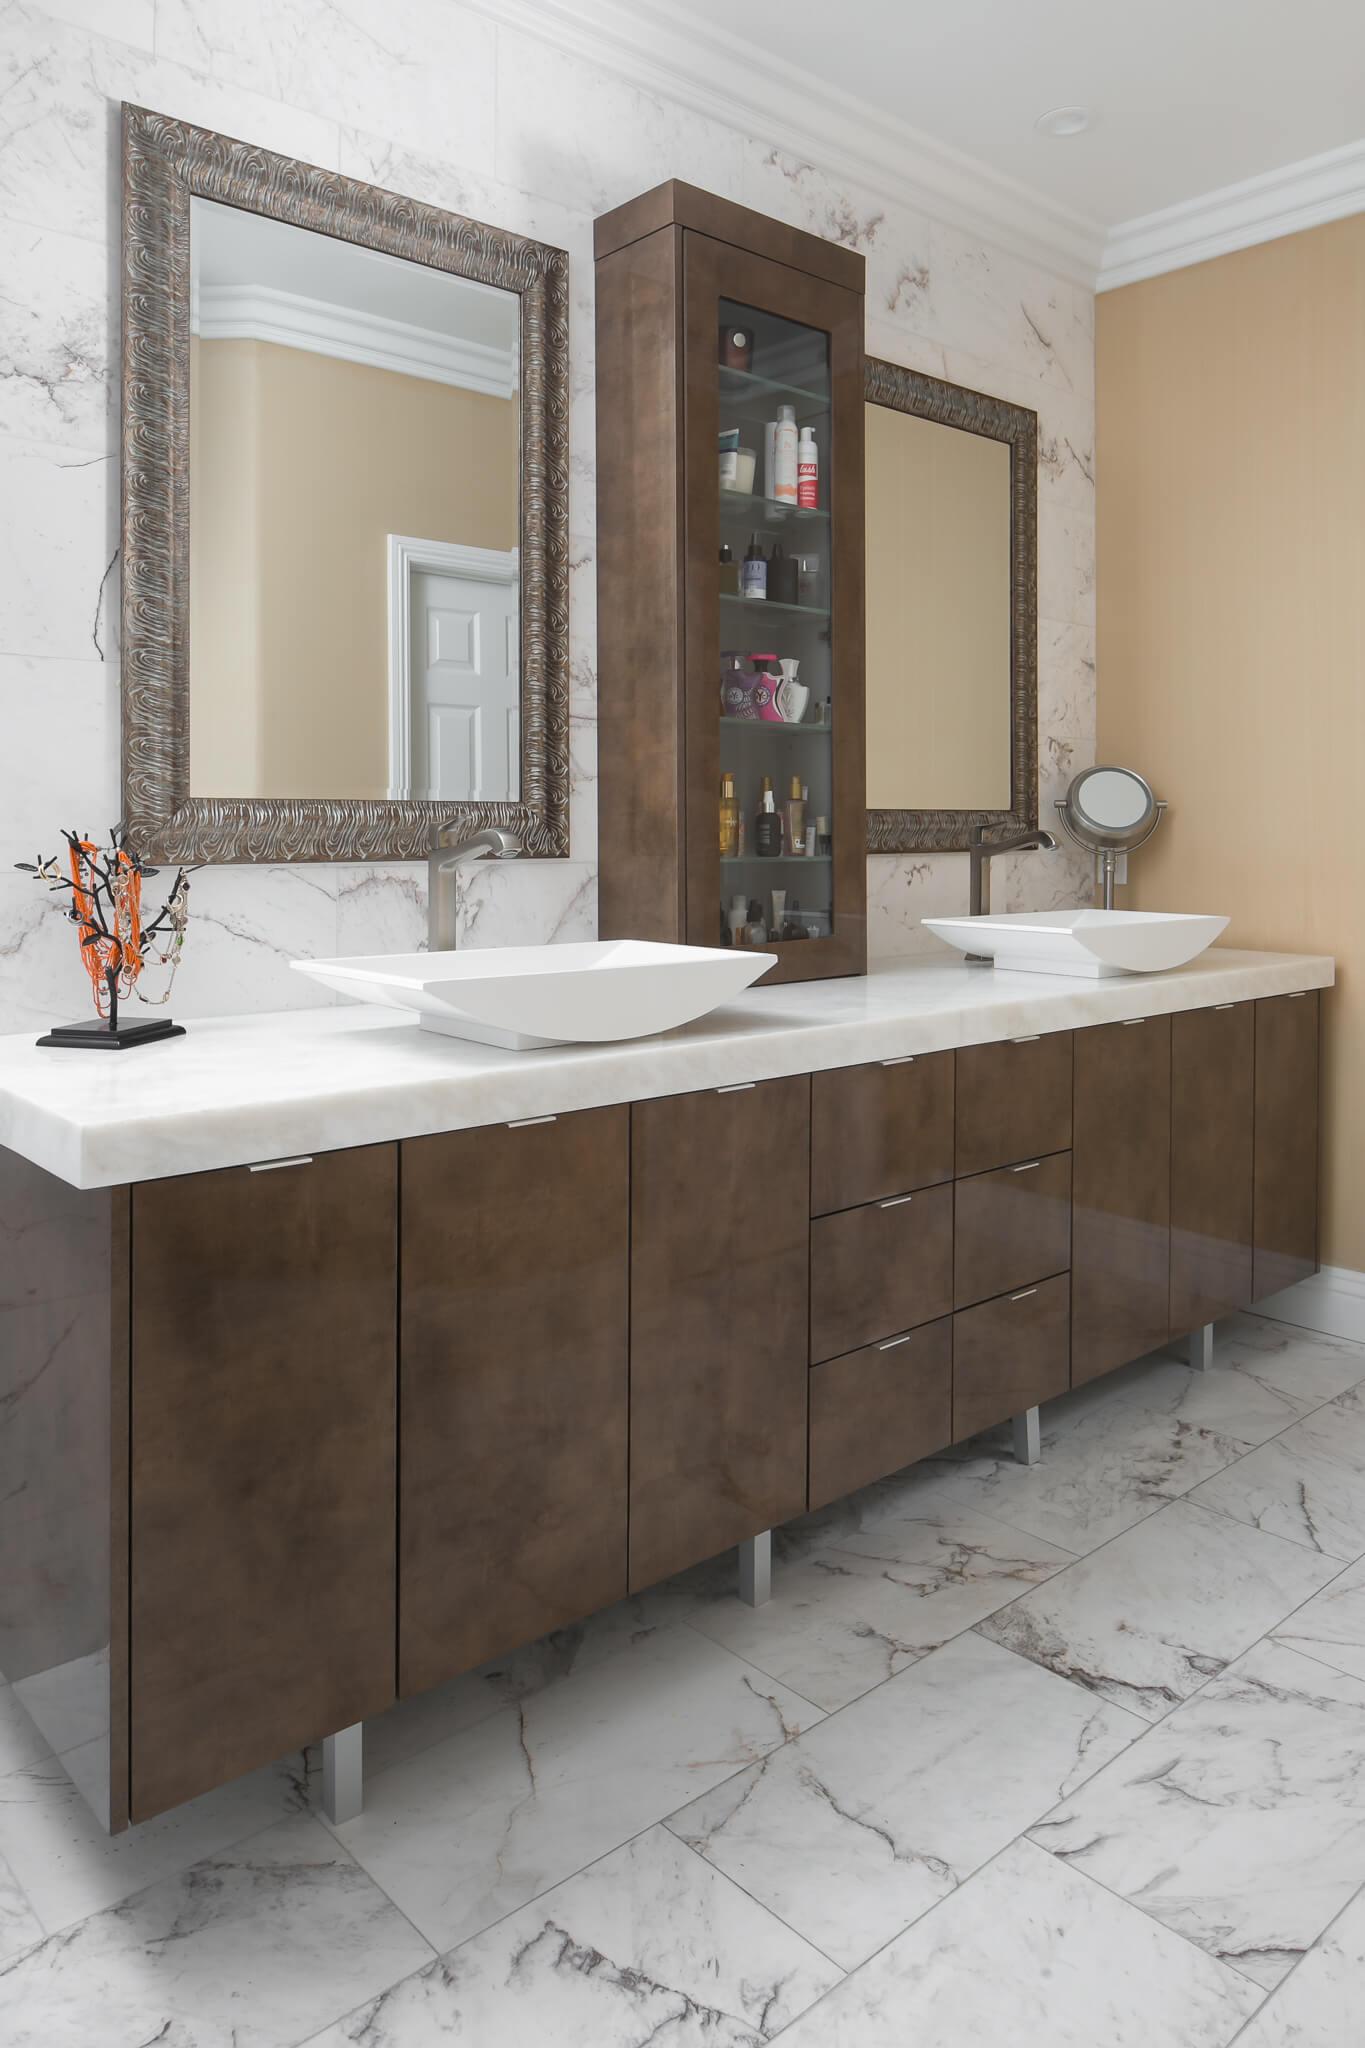 Custom_bathroom_contemporary_polyurethanelaquer_ptflat_highgloss_japanesebrownpatina_03